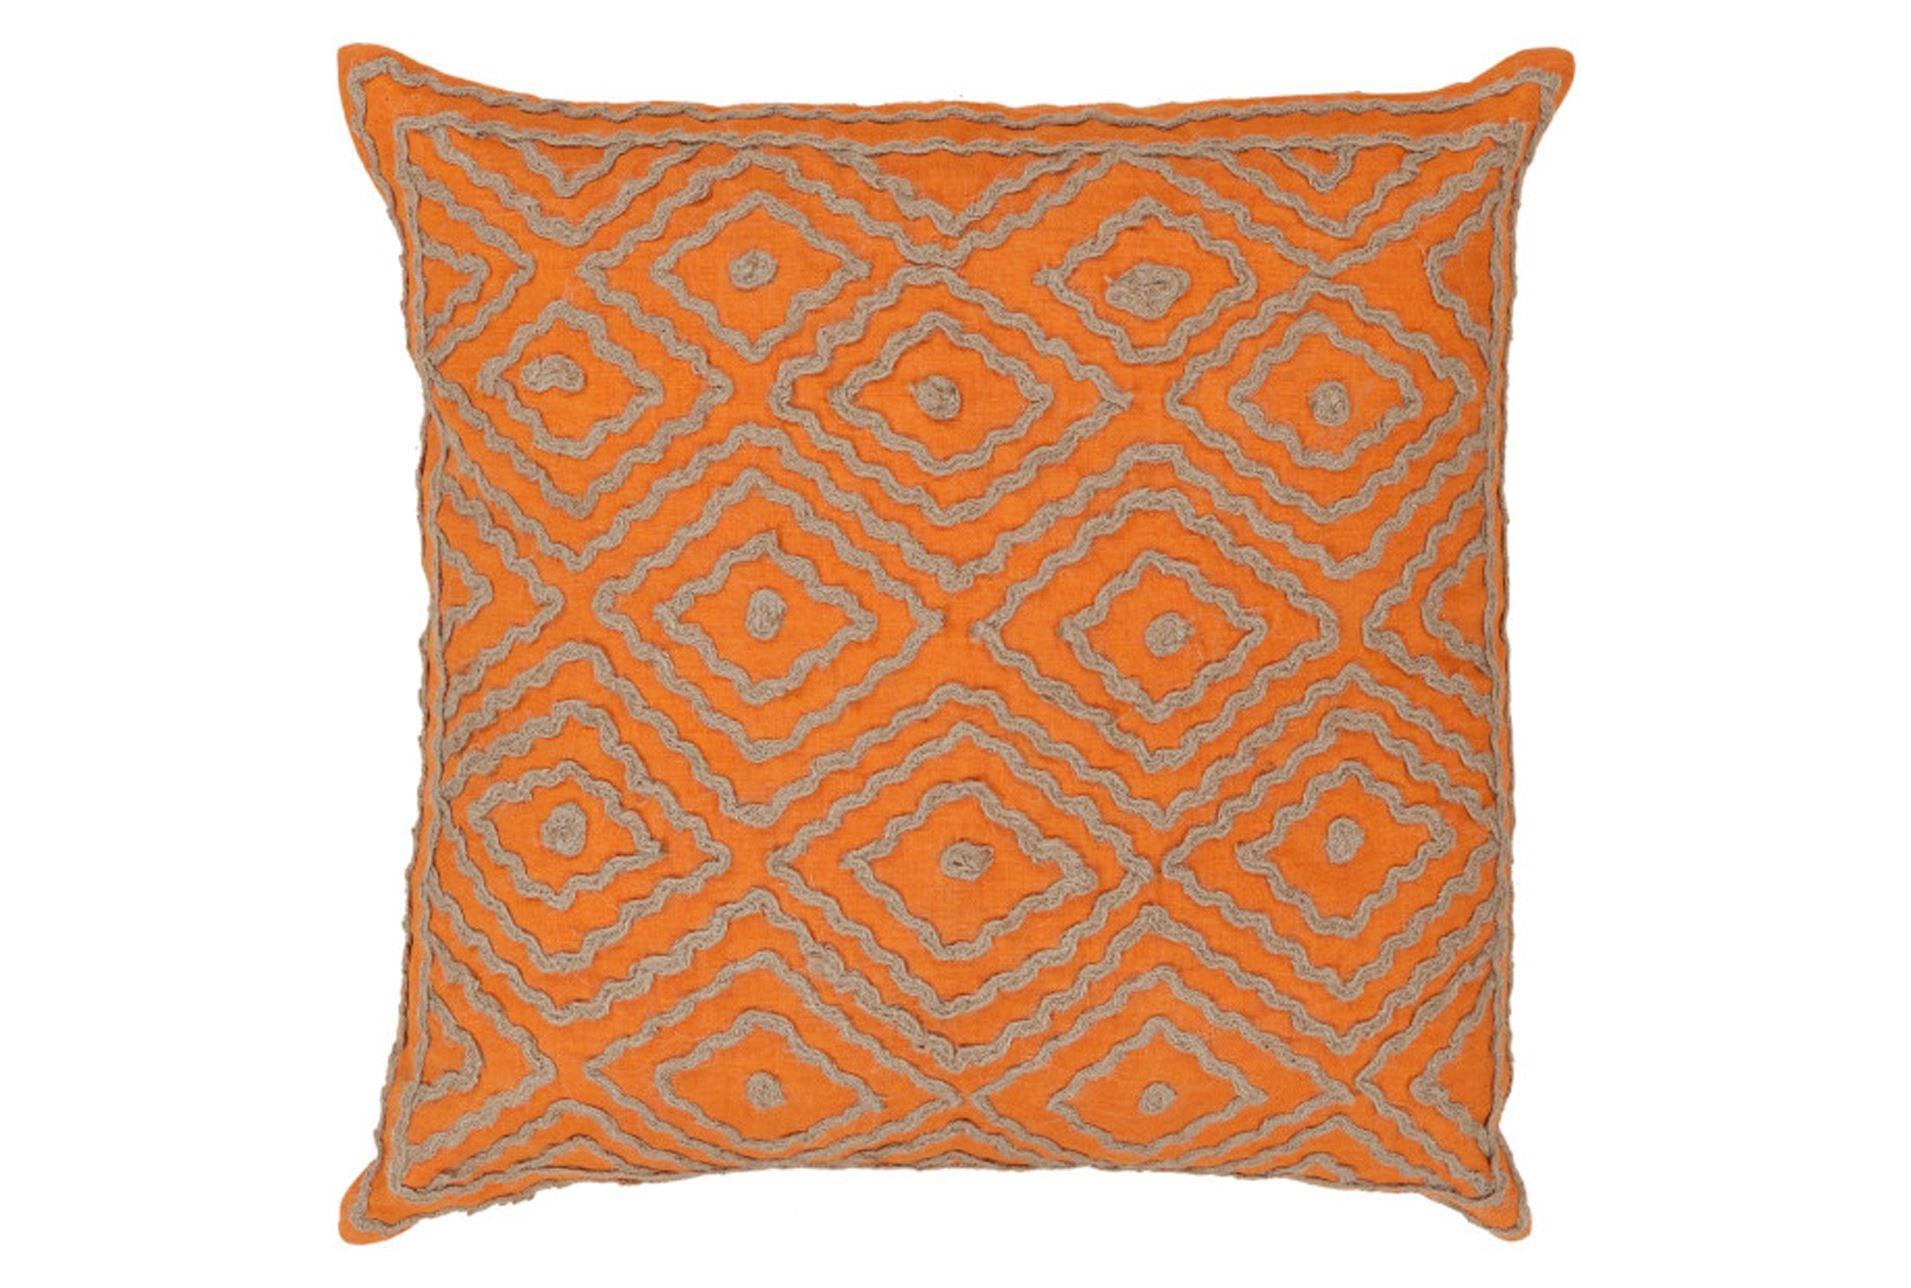 Decorative Pillows Living Spaces : Accent Pillow-Patin Orange 18X18 - Living Spaces